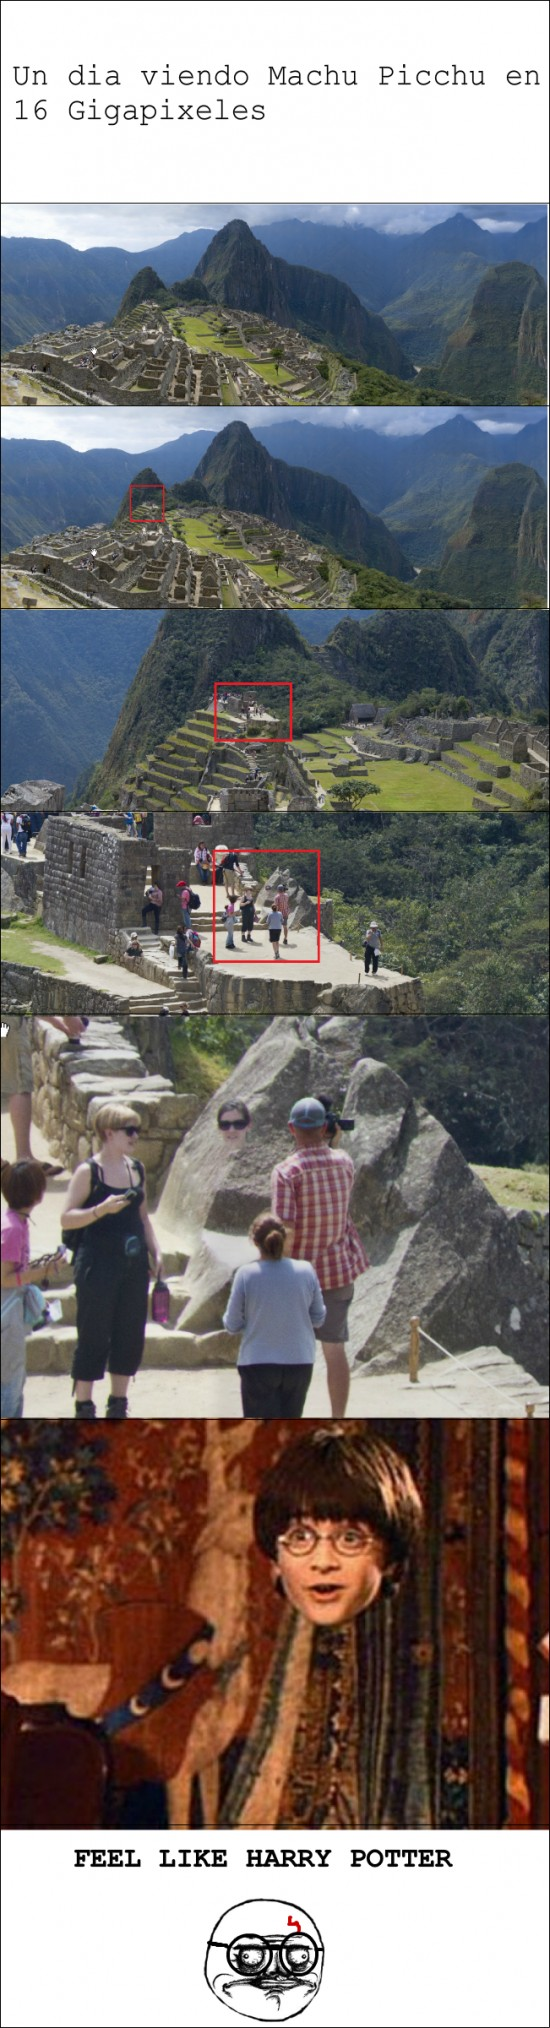 Capa invisibilidad,Harry Potter,Invisible,Machu Picchu,Me Gusta